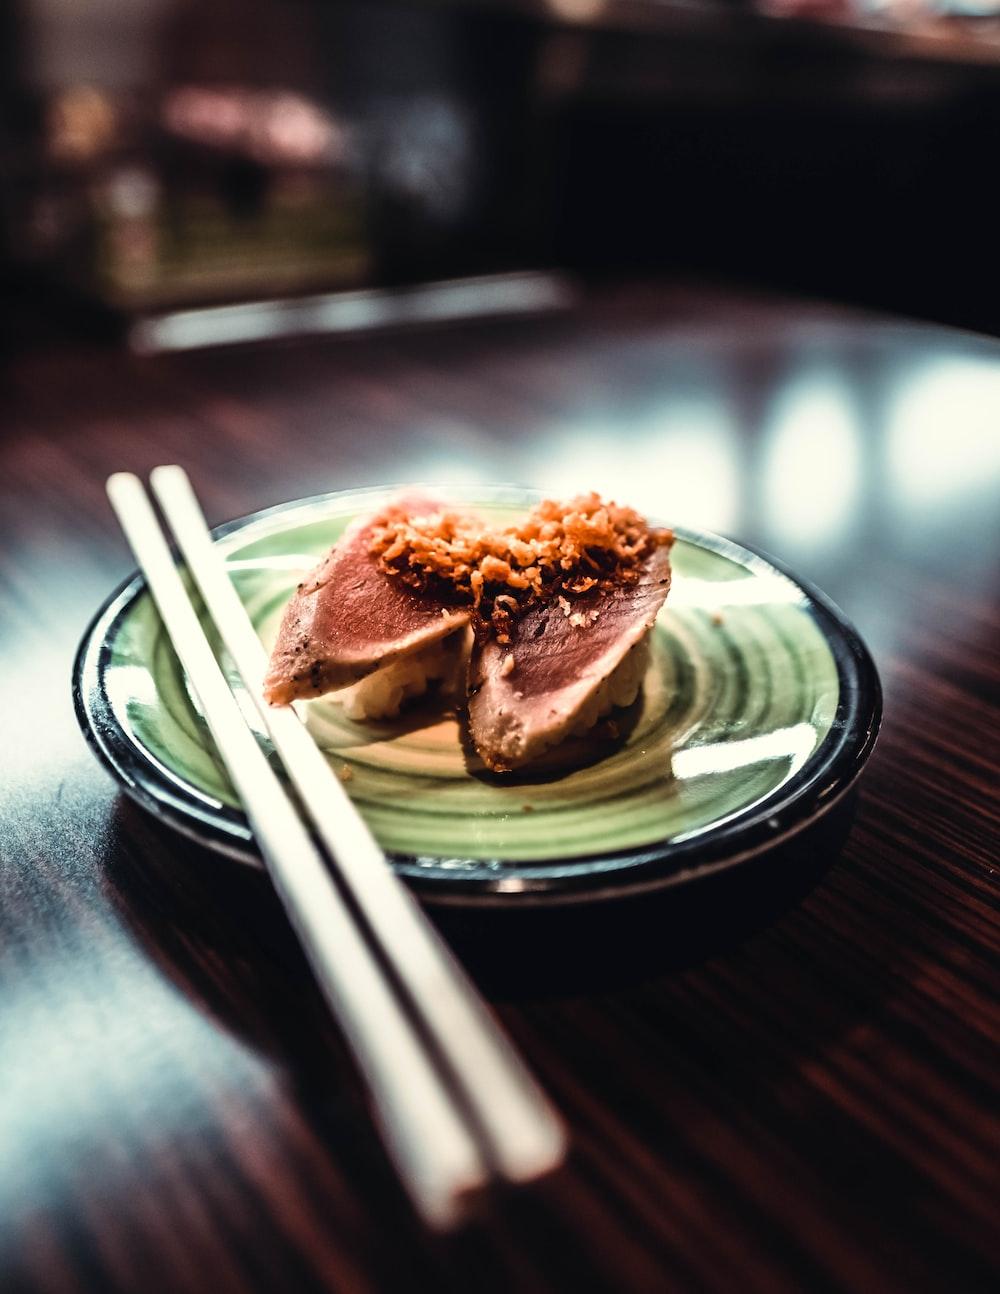 round green plate